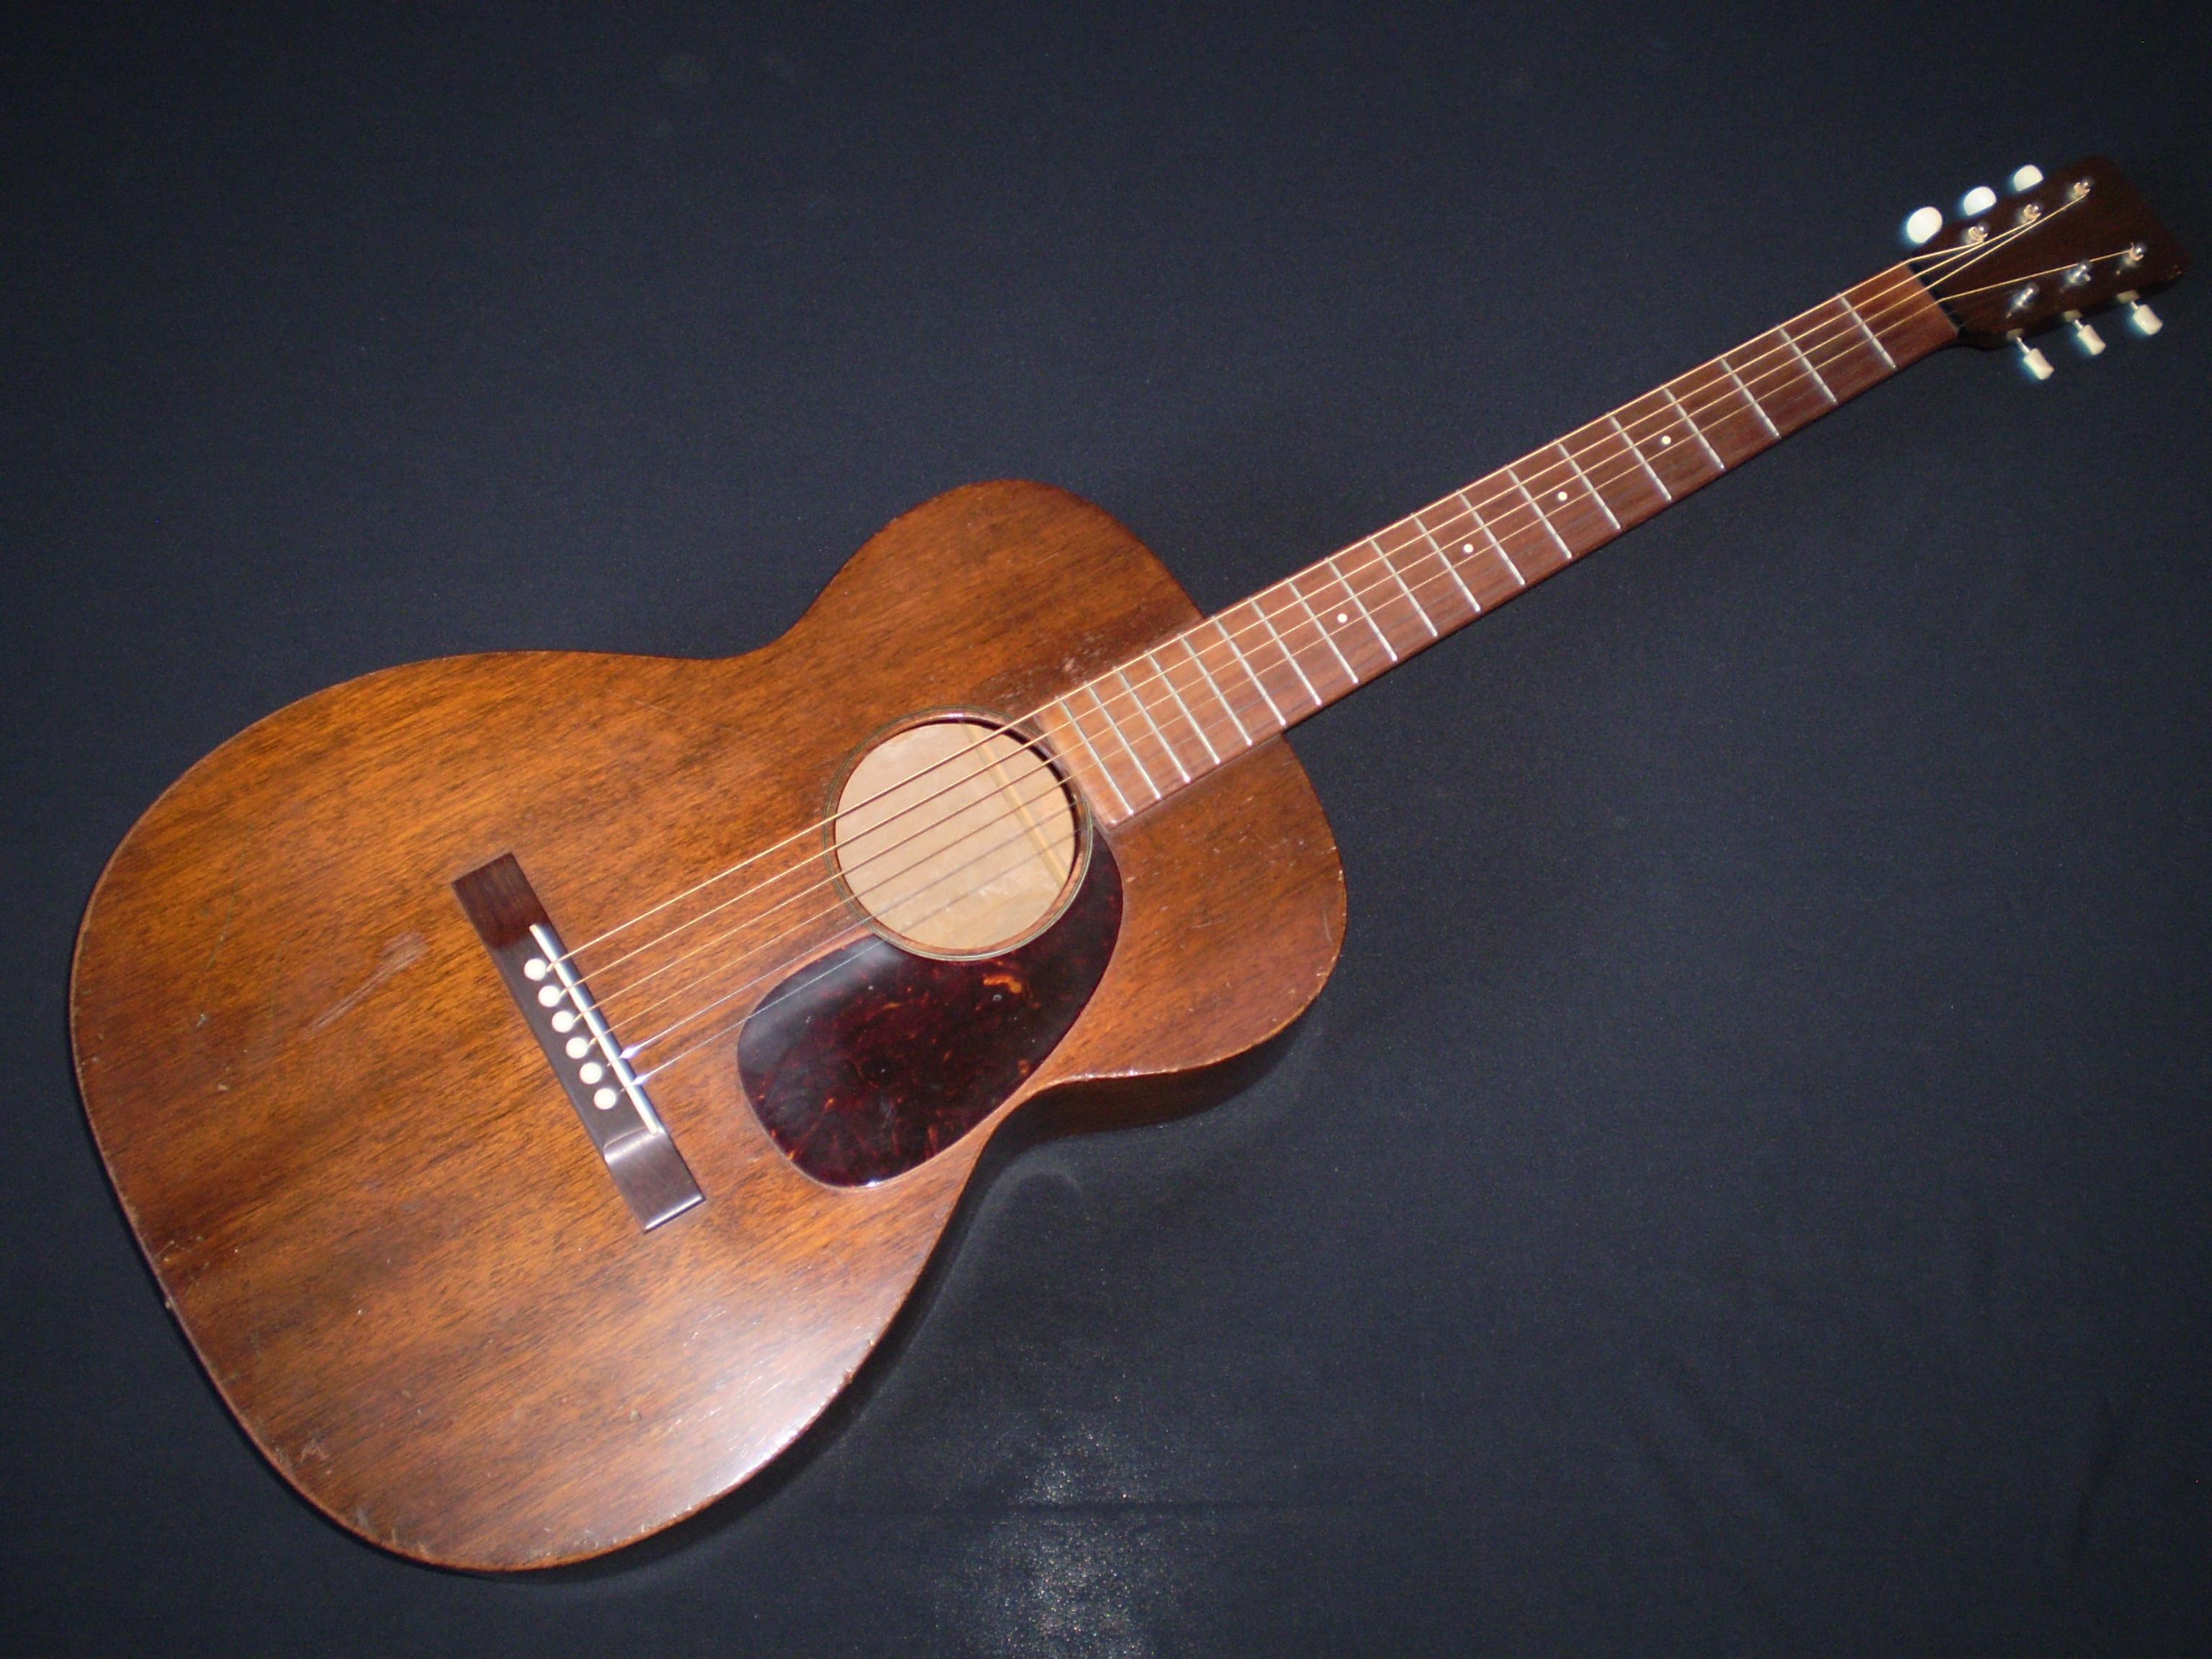 martin 0 15 1951 mahogany guitar for sale glenns guitars. Black Bedroom Furniture Sets. Home Design Ideas